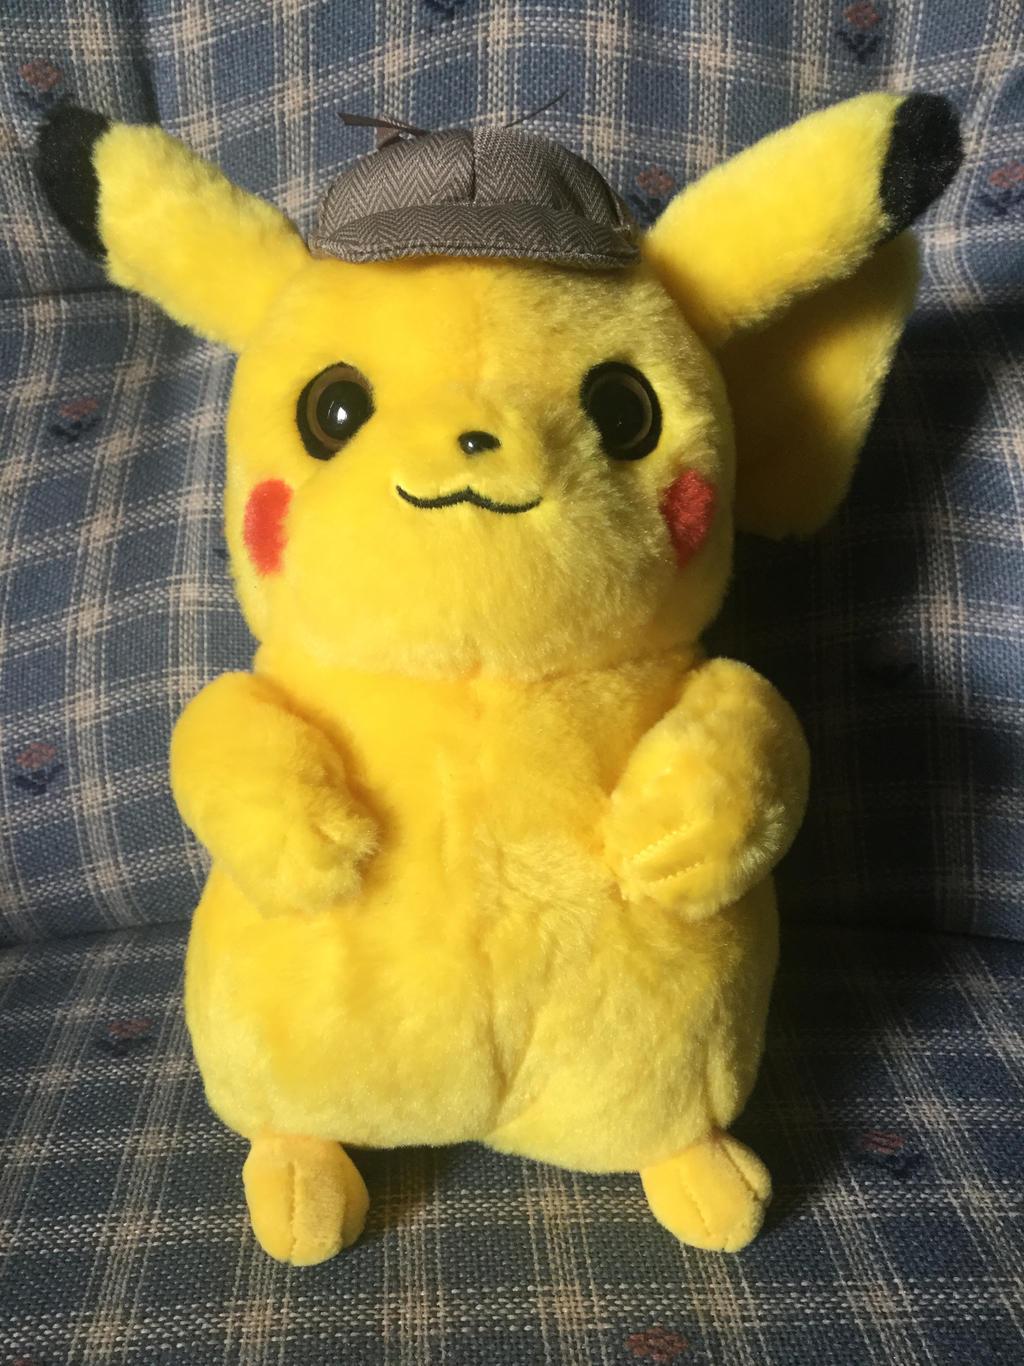 I Got A Detective Pikachu Plushie By Cartoonguy17 On Deviantart